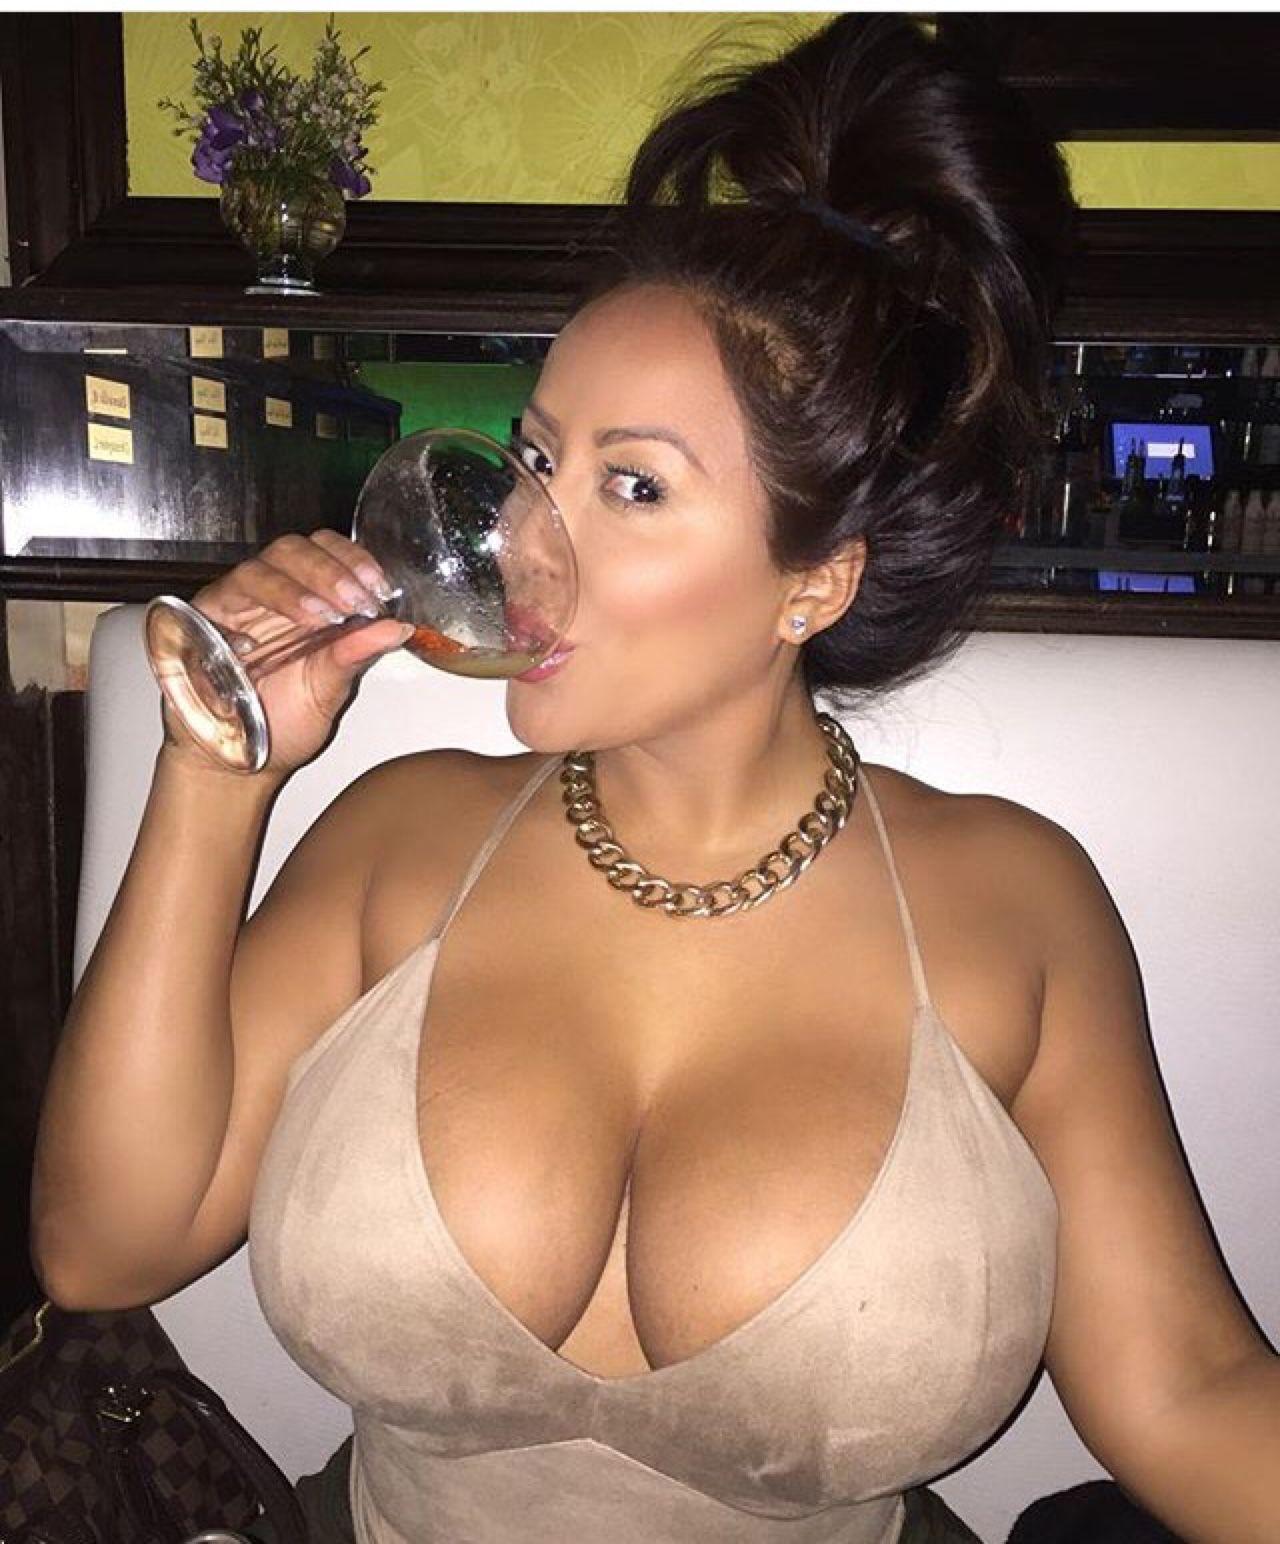 best boob search